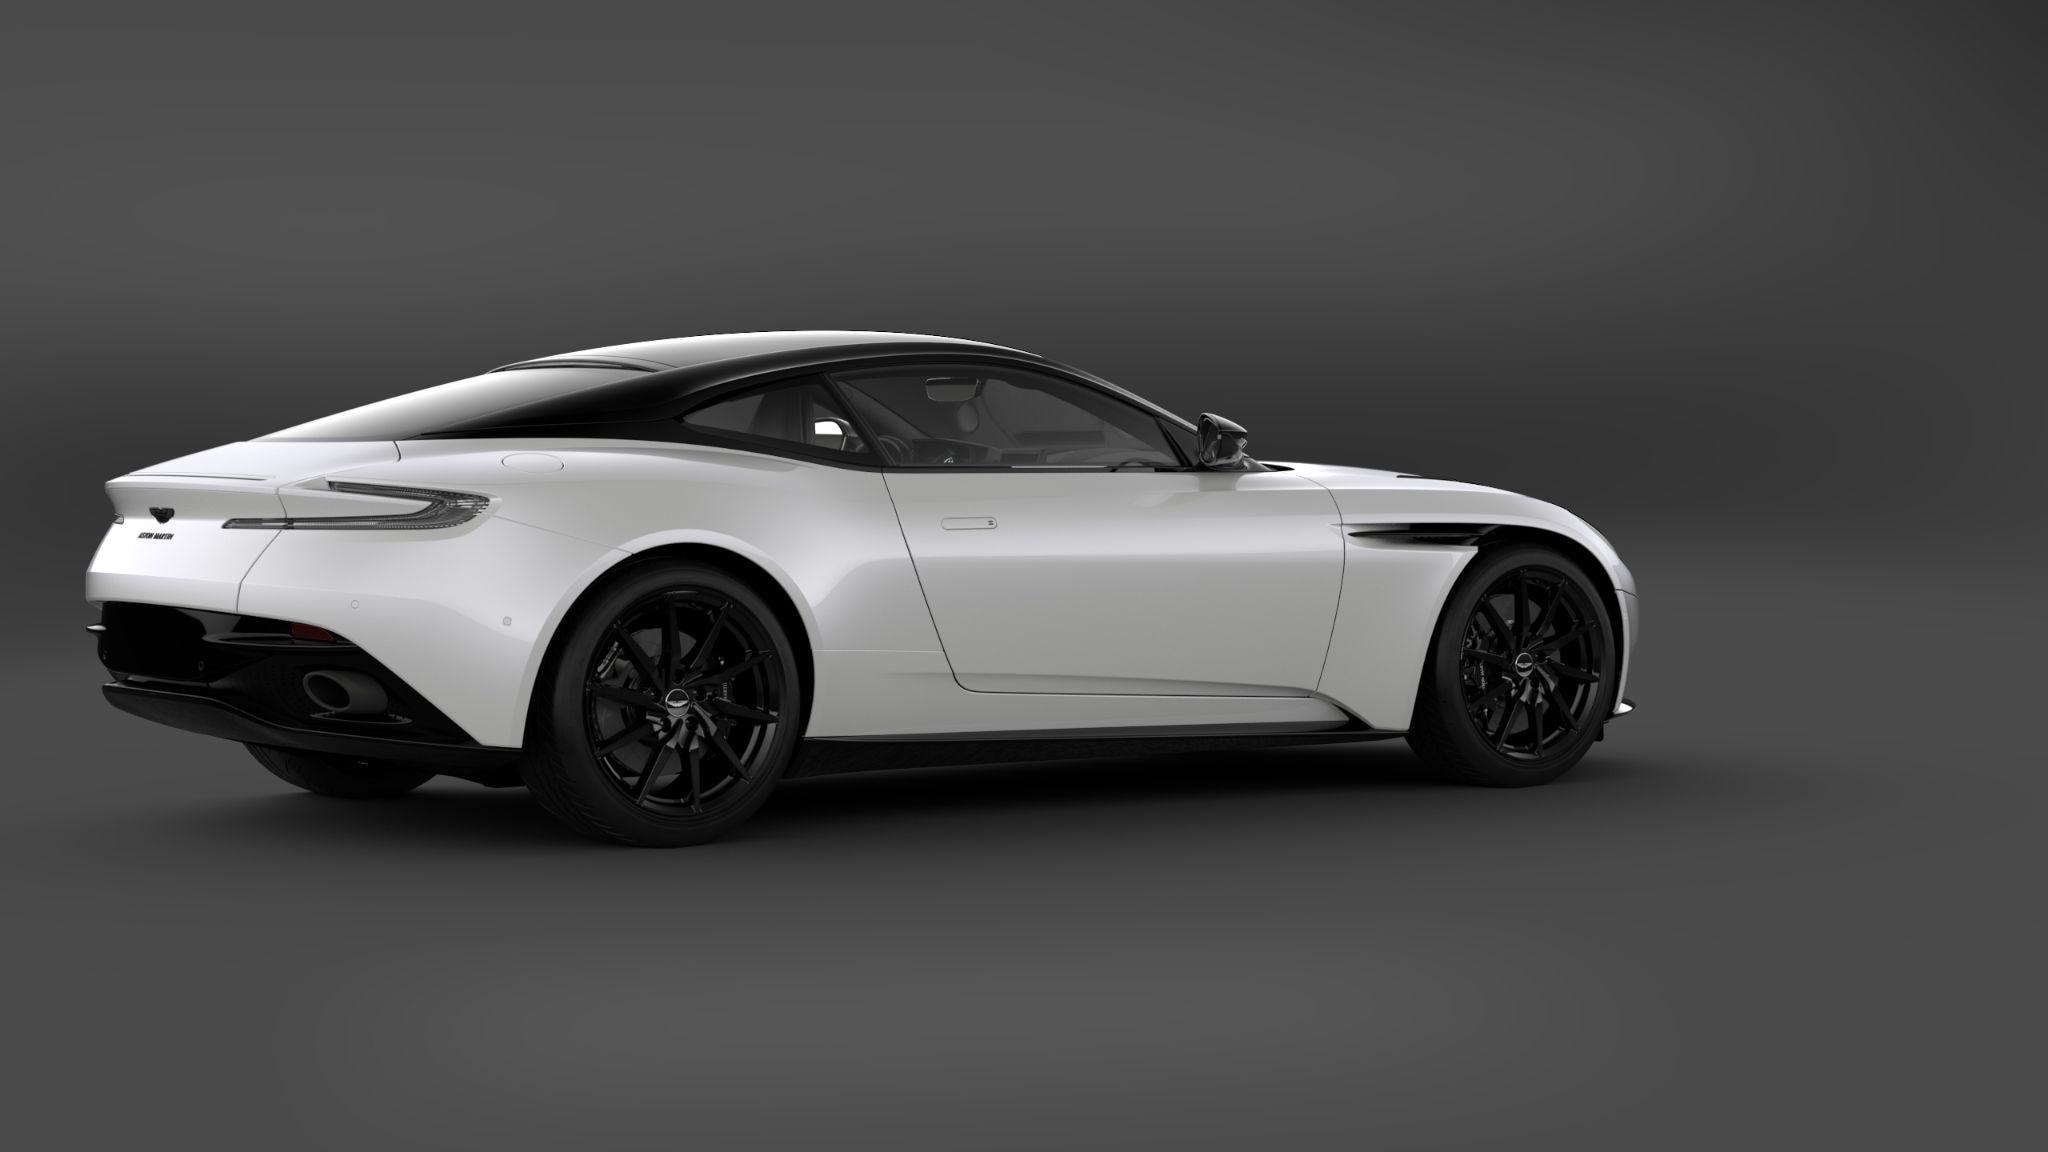 2021 Aston Martin Db11 Shadow Edition Is A Black Wagon Technology Shout